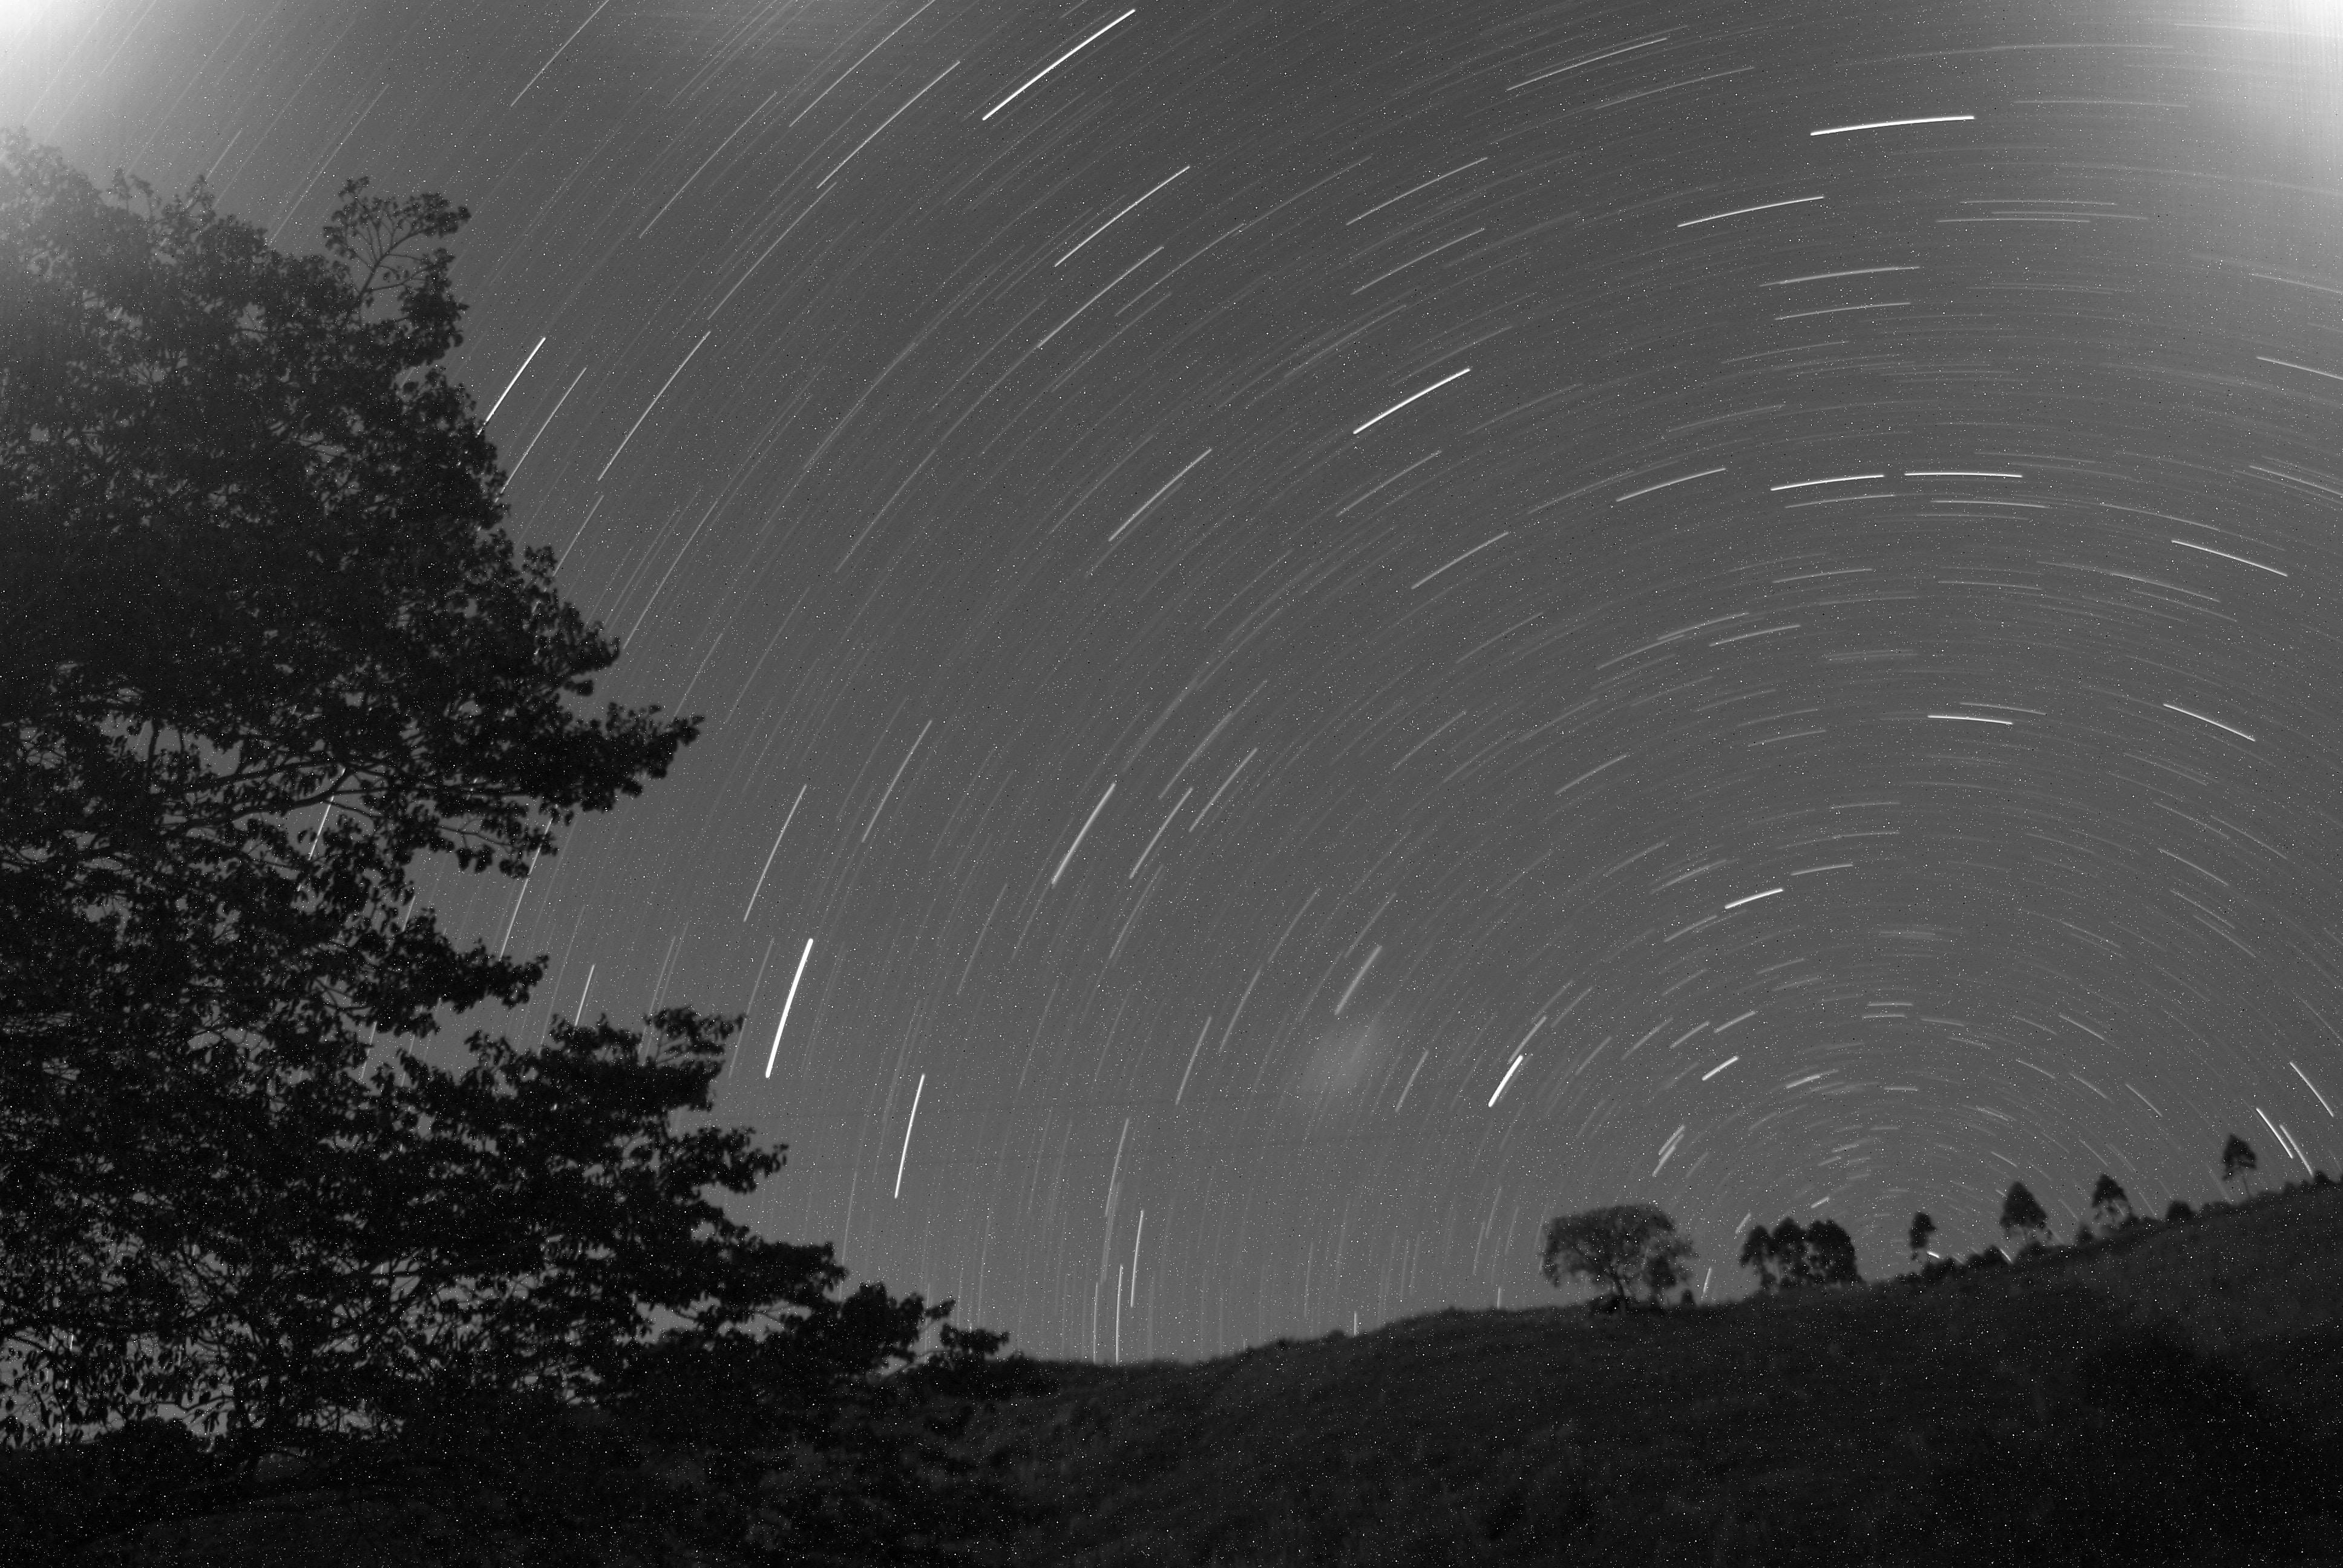 Stars form spirals across the night sky